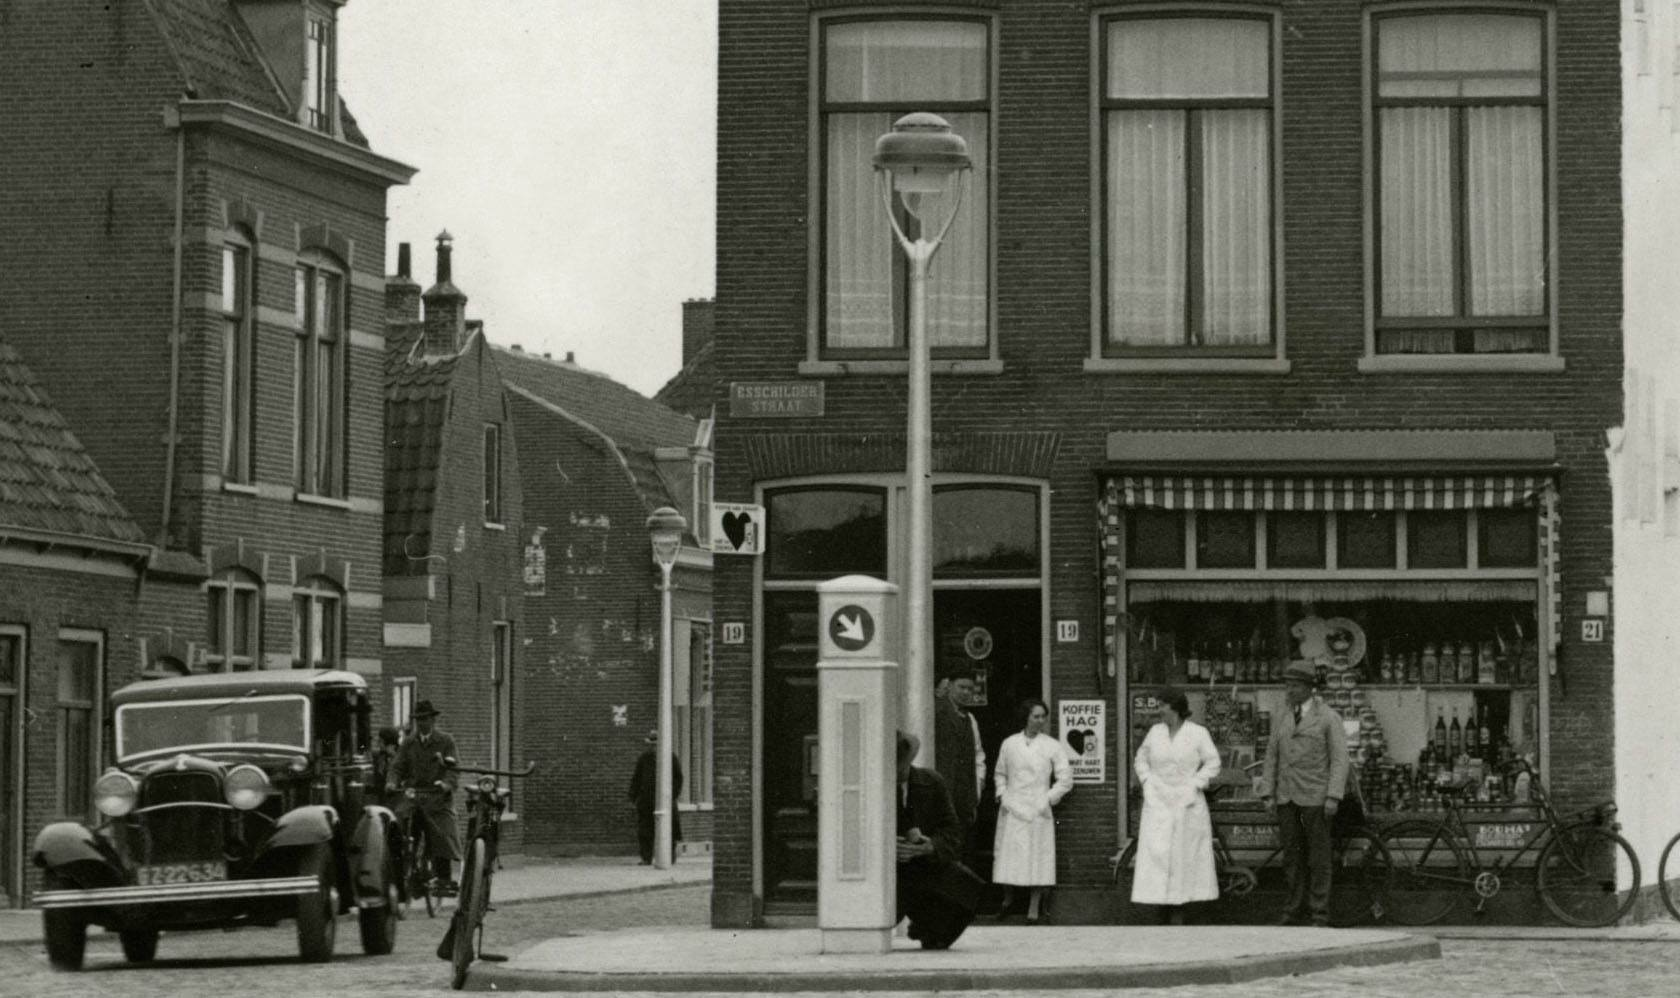 1936-Haarlem-Rustenburgerlaan--sta-in-de-weg--winkel-met-Ford-kopklepmotor-model-B-uit-1932